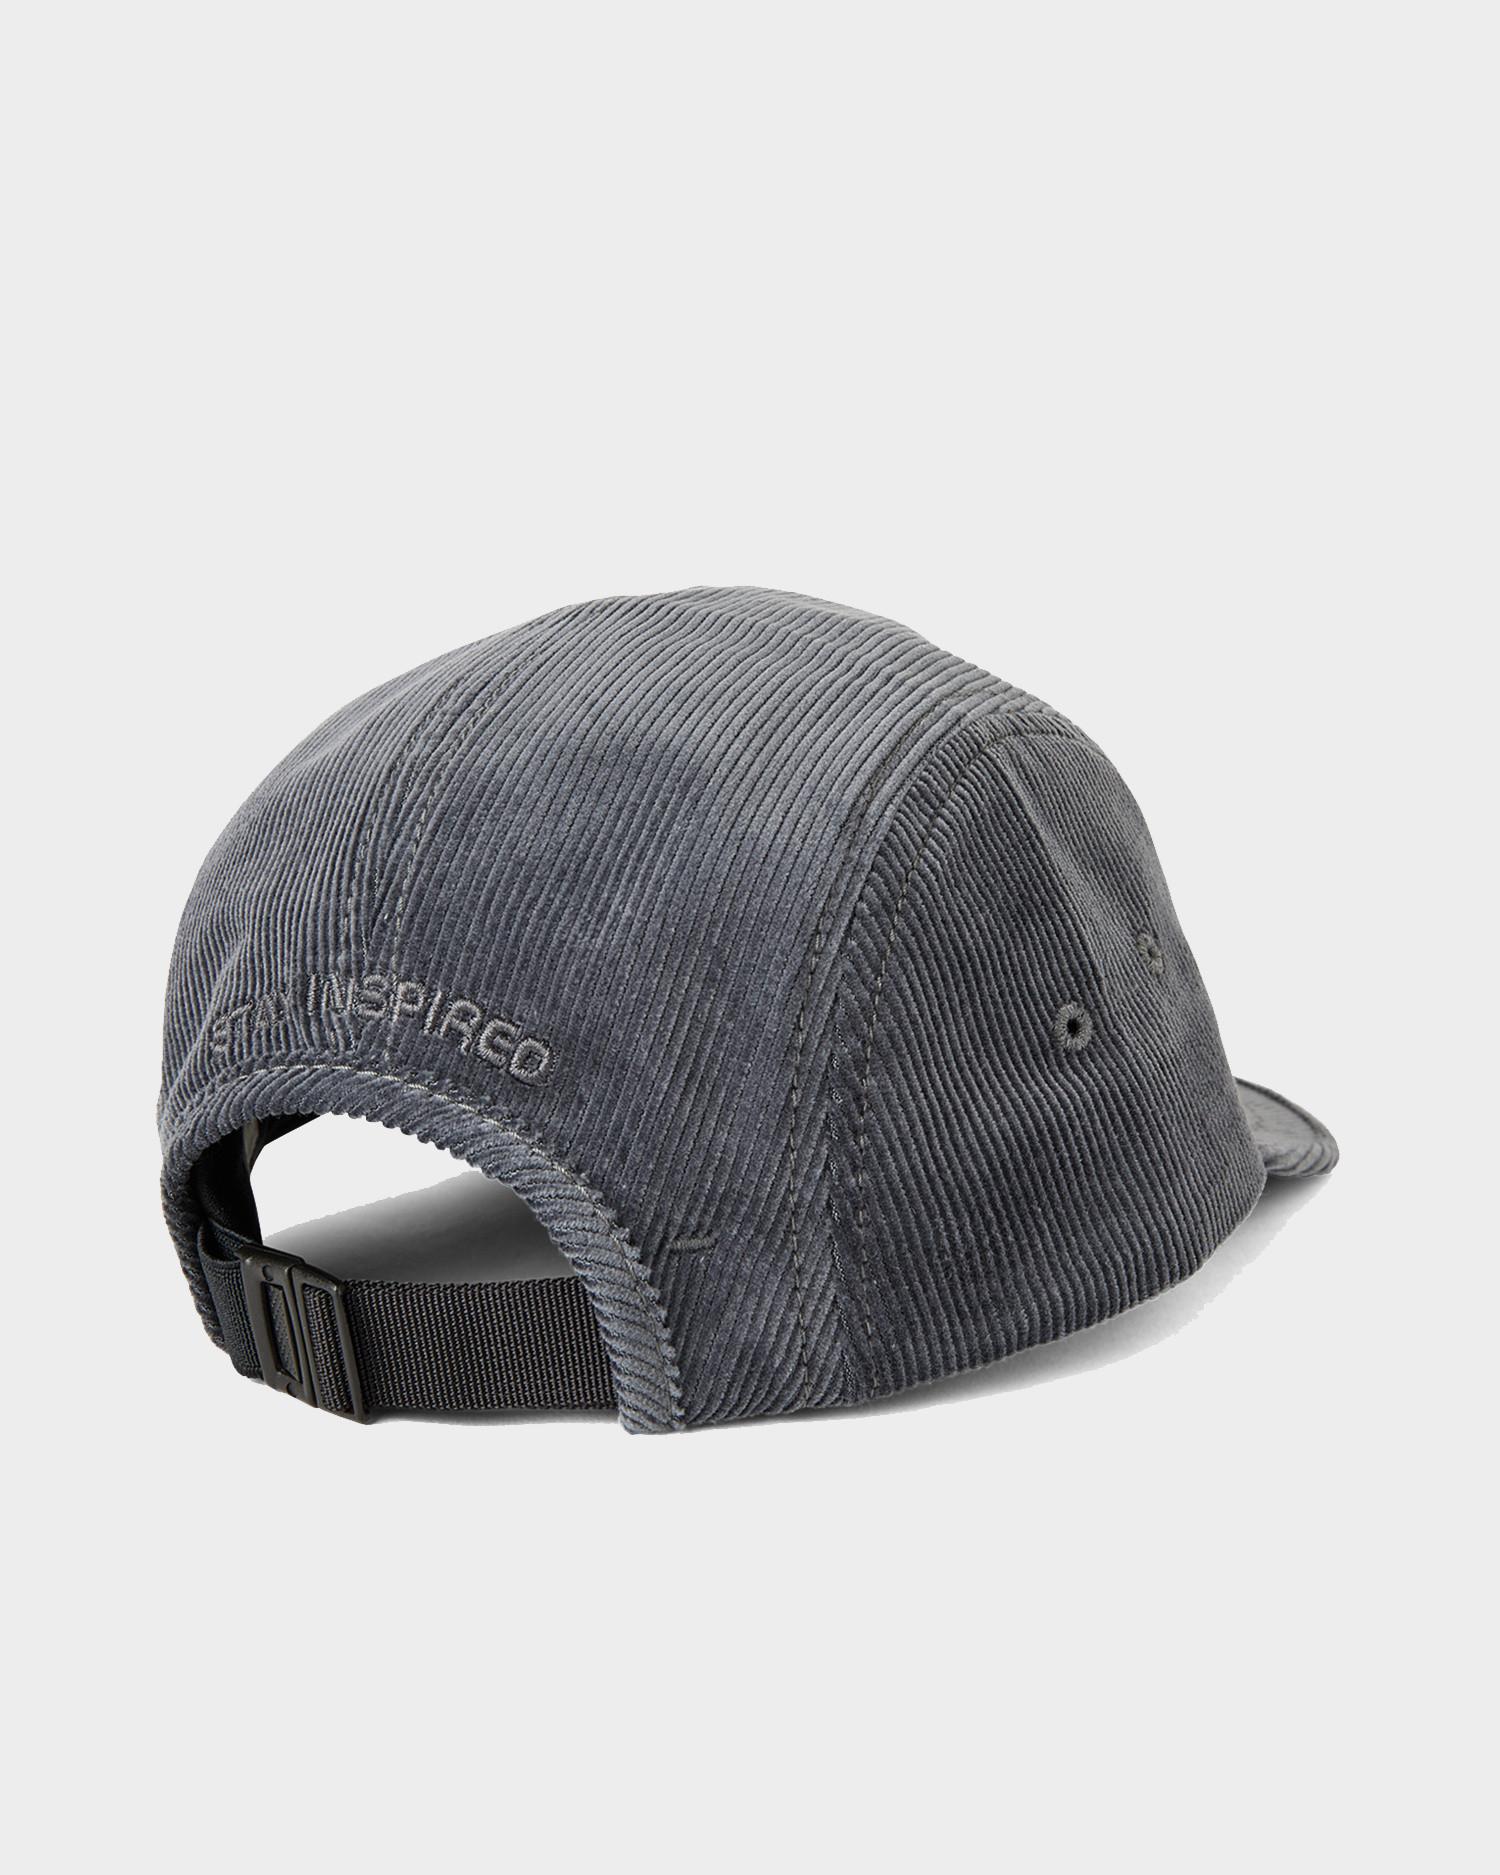 Polar Cord Speed Co Cap Light Grey